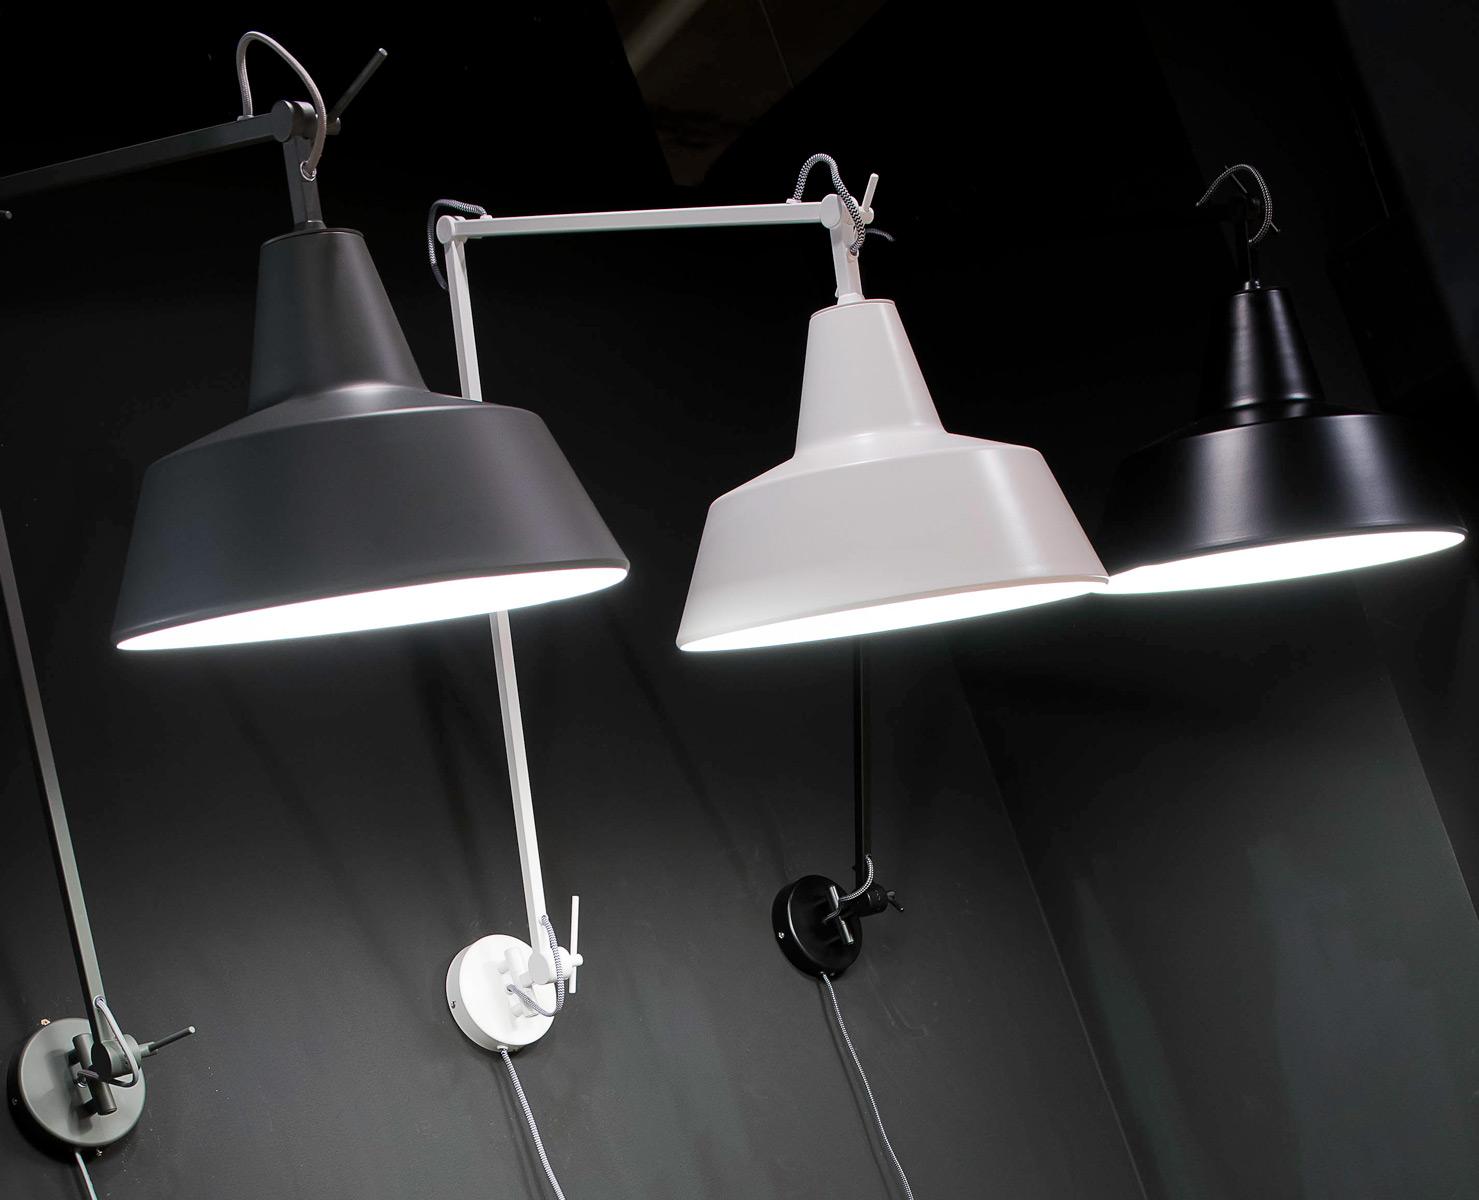 Plafoniere Industrial Style : Große gelenk wandleuchte im industrial look drei farben casa lumi